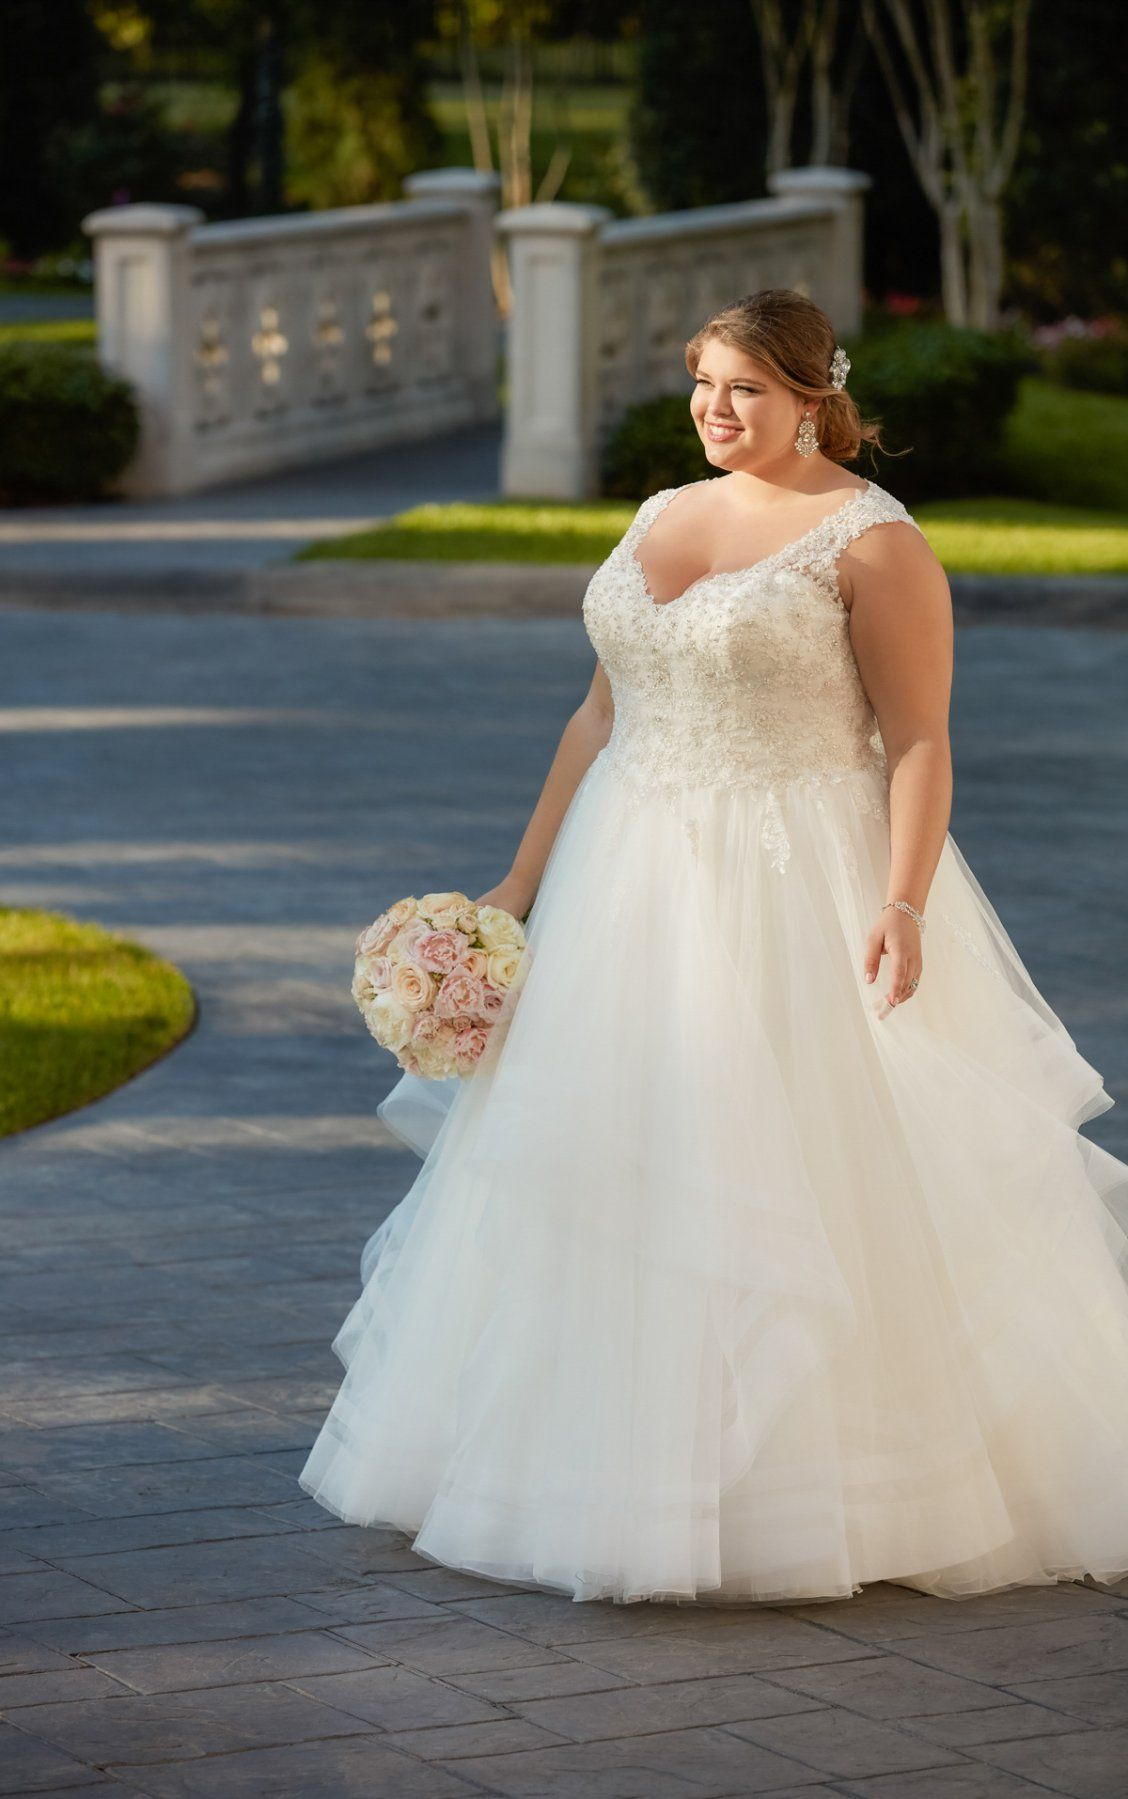 Wedding Dresses Princess Ballgown With Horsehair Skirt Stella York Ball Gowns Wedding Plus Size Wedding Gowns Ball Gown Wedding Dress [ 1799 x 1128 Pixel ]